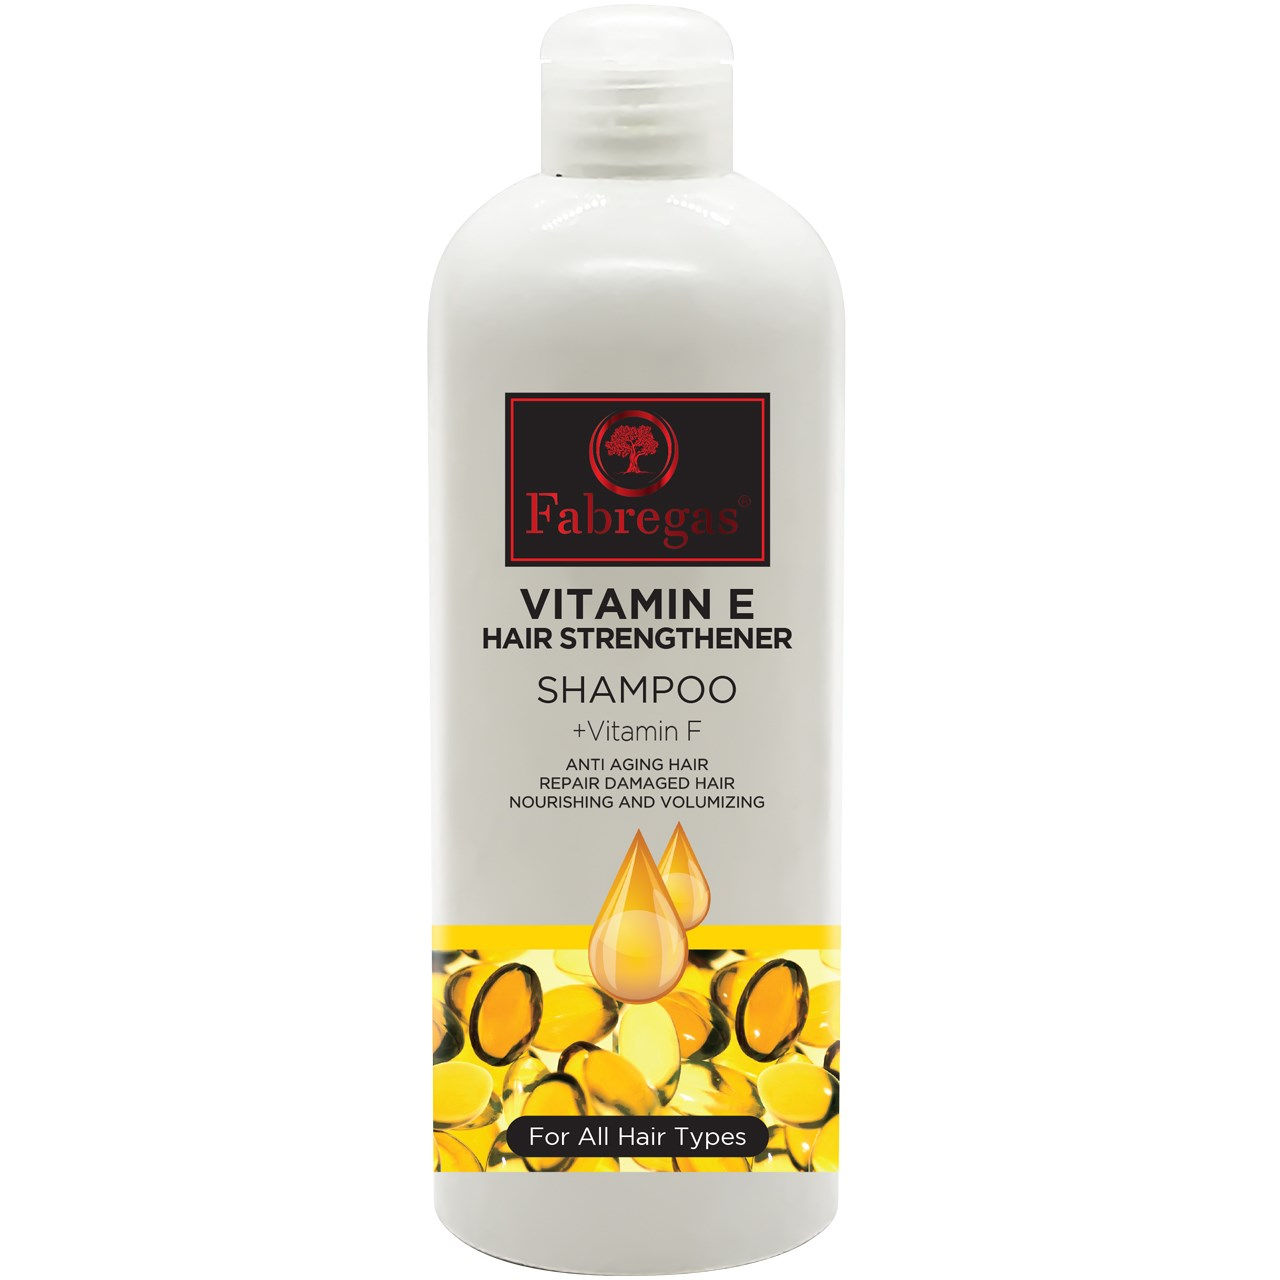 شامپو مو ترميم كننده فابريگاس مدل Vitamin E حجم 400 ميلي ليتر